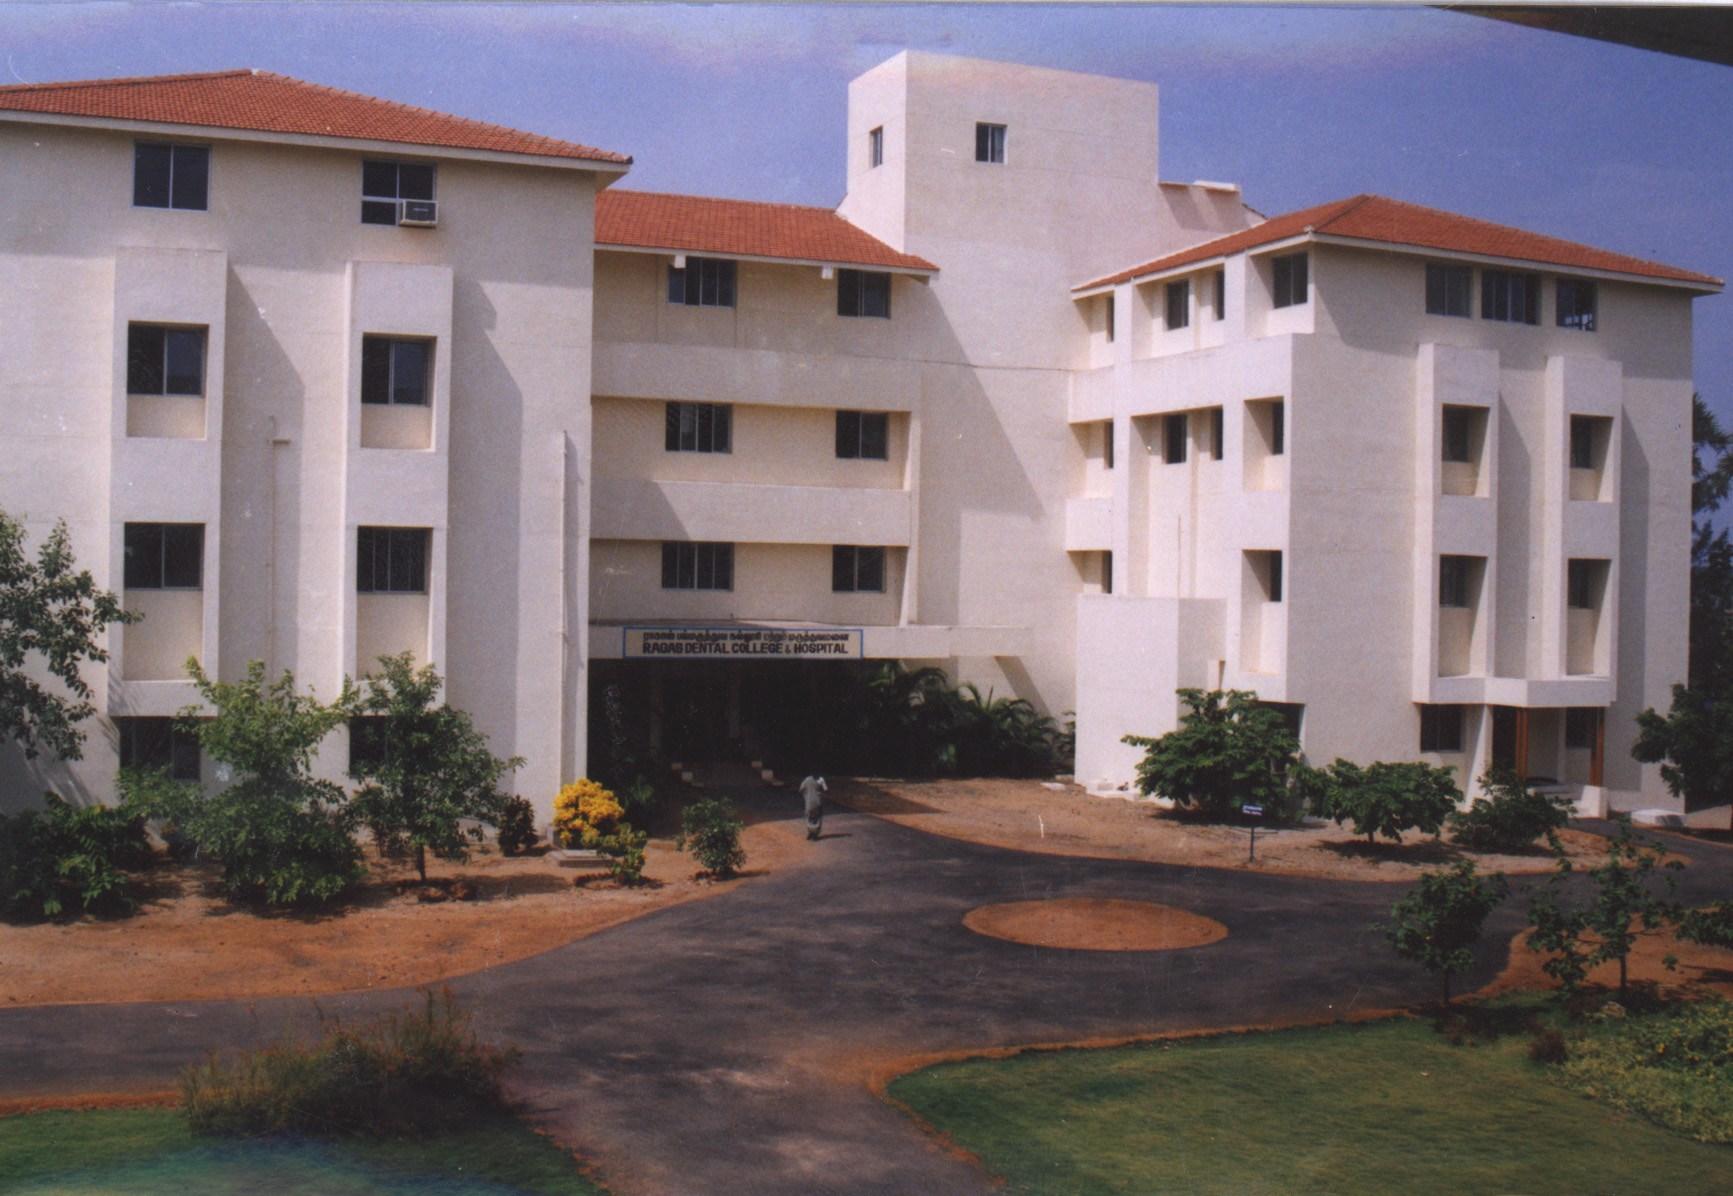 Ragas Dental College and Hospital, Chennai Image